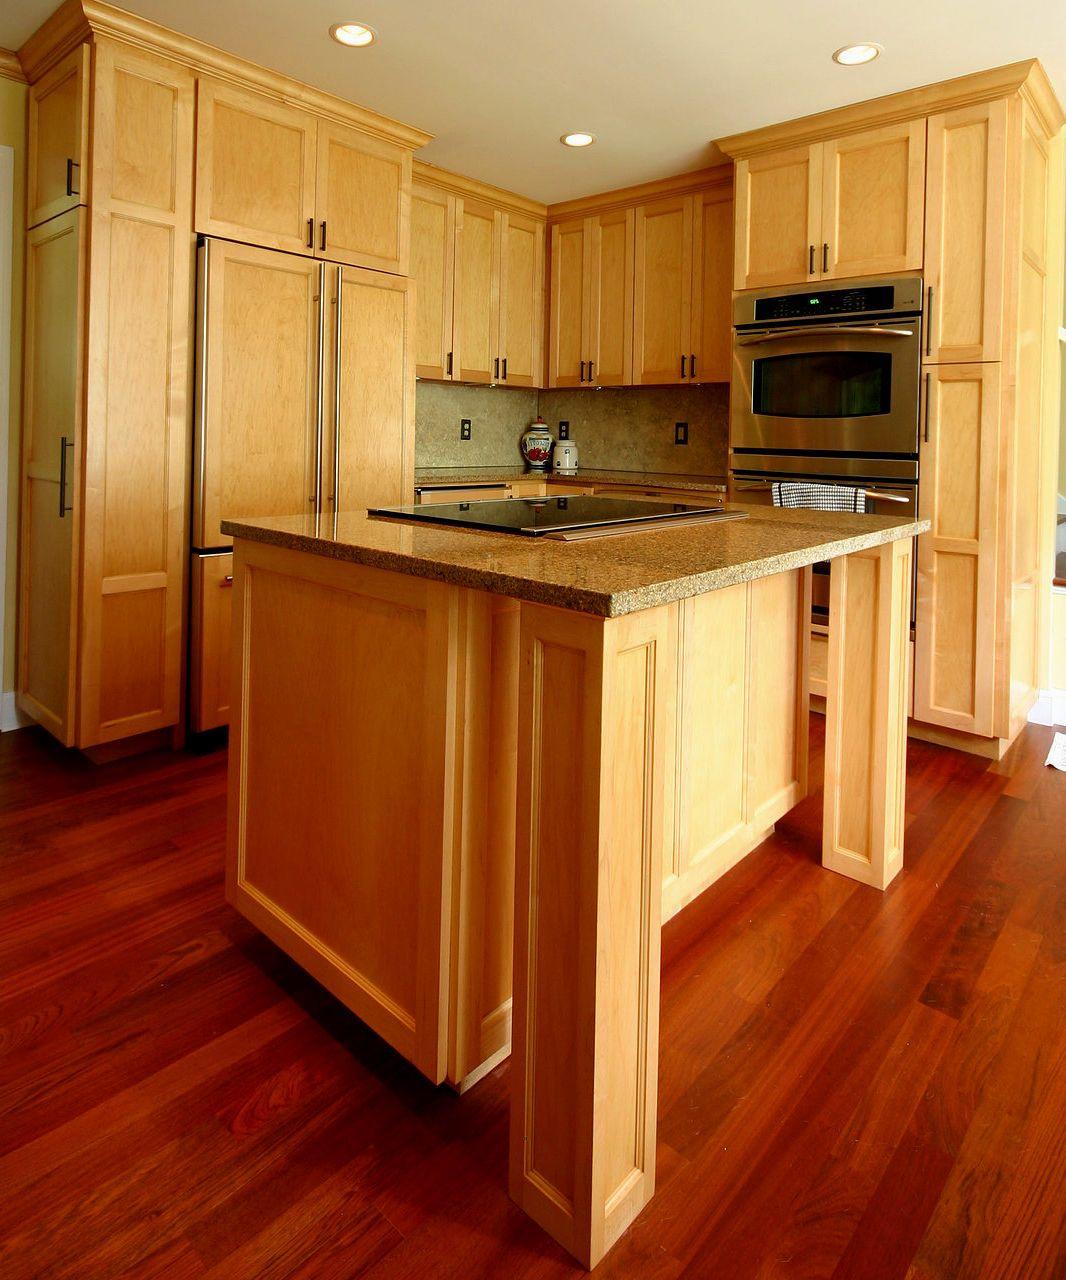 Modern Oak Cabinets With Dark Wood Floors Compact Honey Oak Cabinets With Dark Wood Floors 11 Oak Kitchen With Images Honey Oak Cabinets Light Oak Cabinets Dark Kitchen Floors